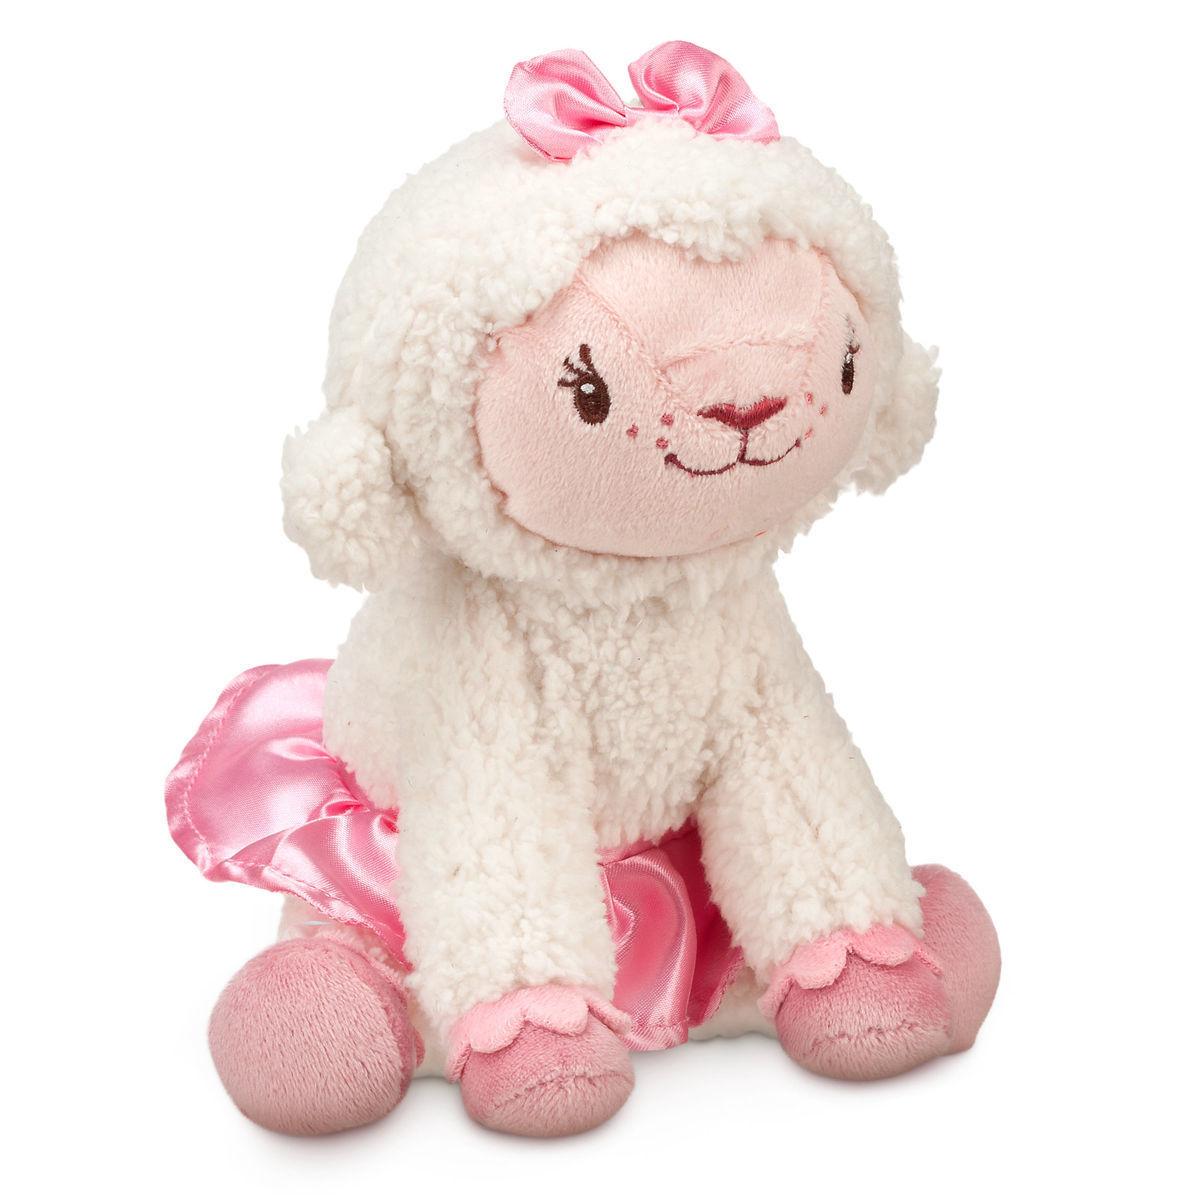 Мягкая игрушка овечка Лэмми - Доктор Плюшева - 17,5 см